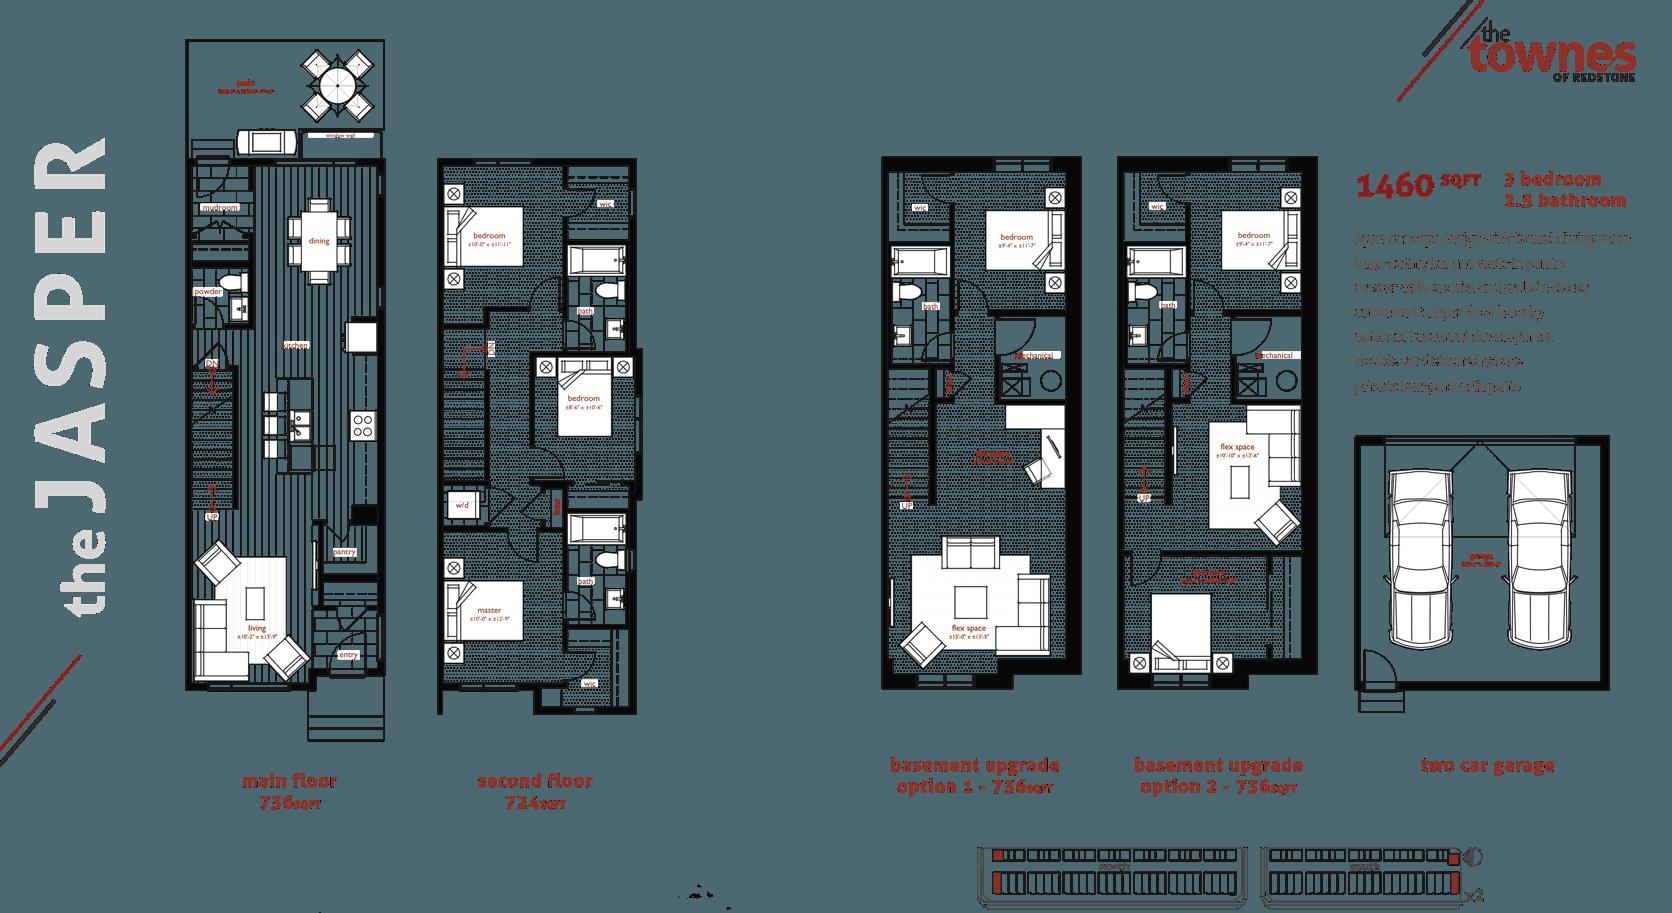 The Best Townhome Designs for Multi-Generational Living Jasper Floorplan Image